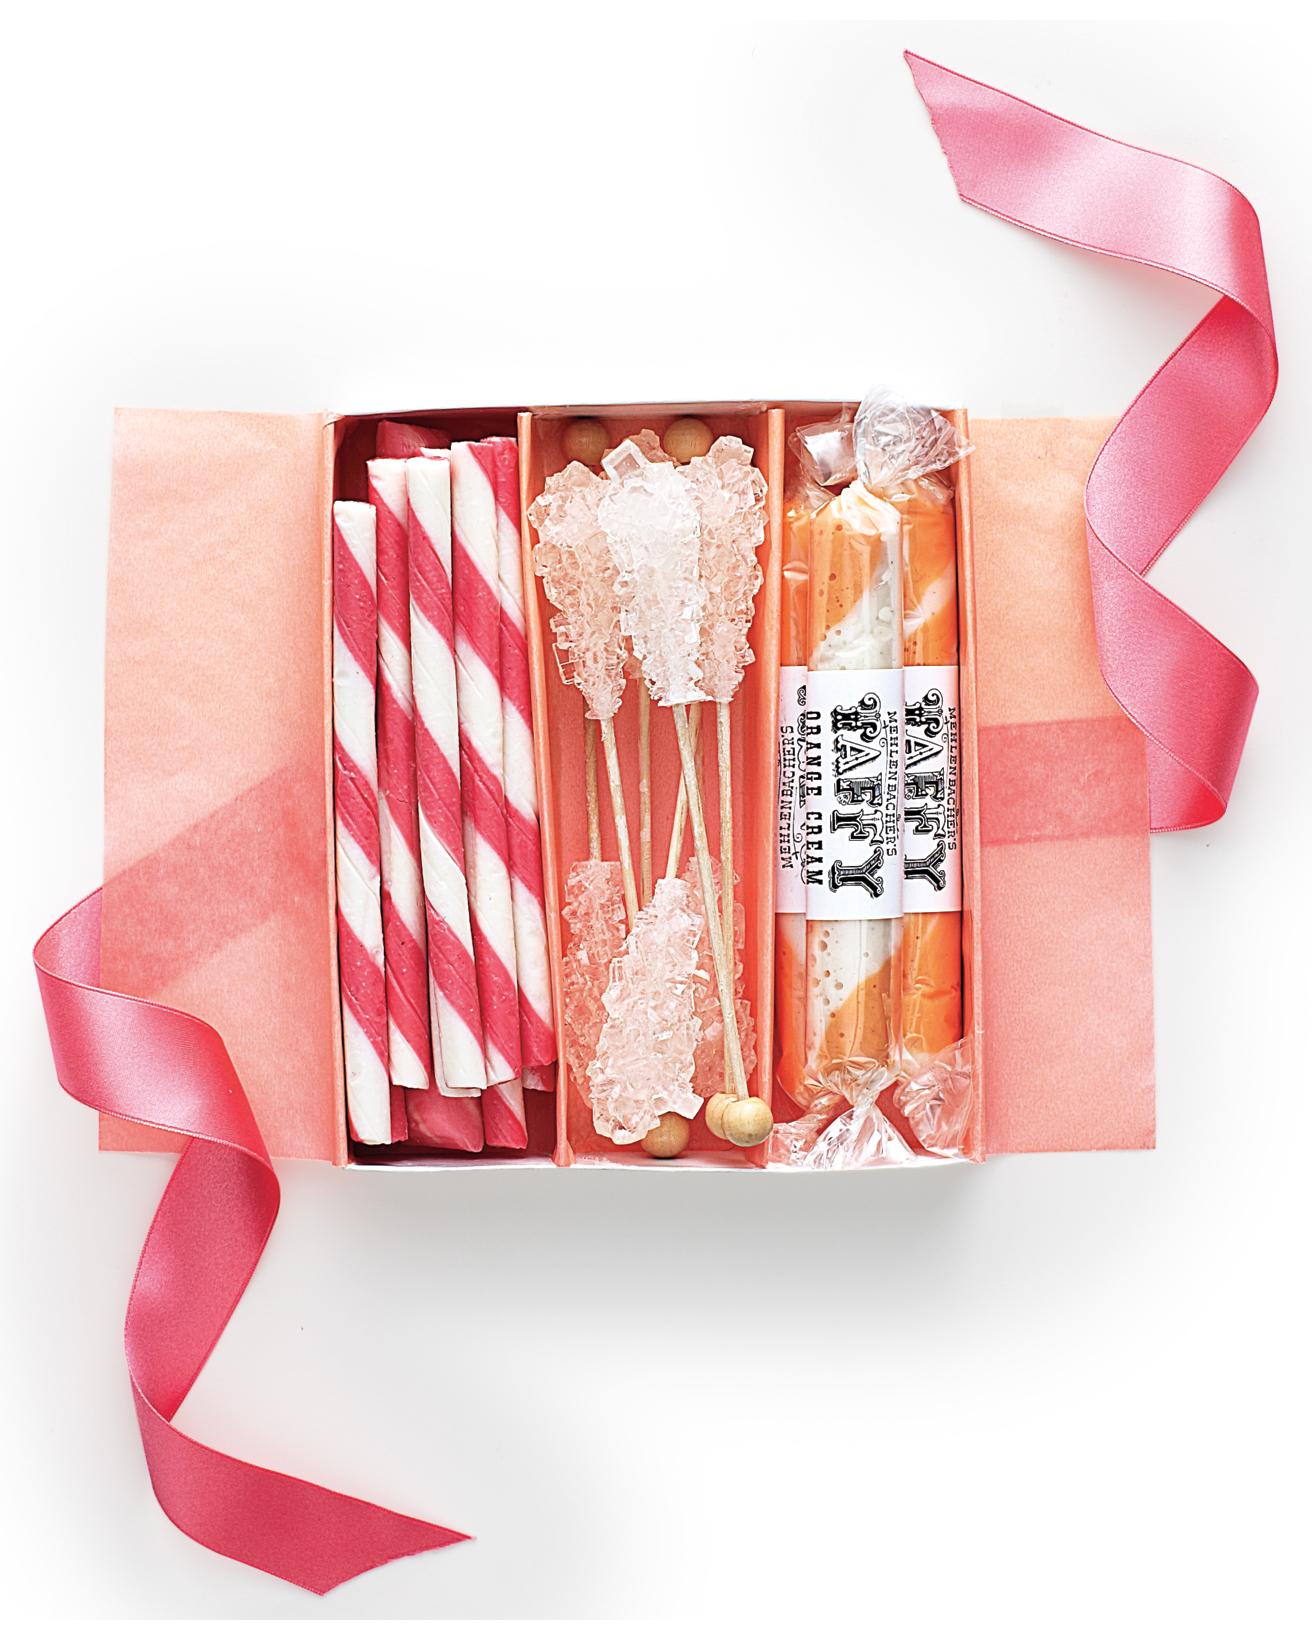 candy-mwd108262.jpg